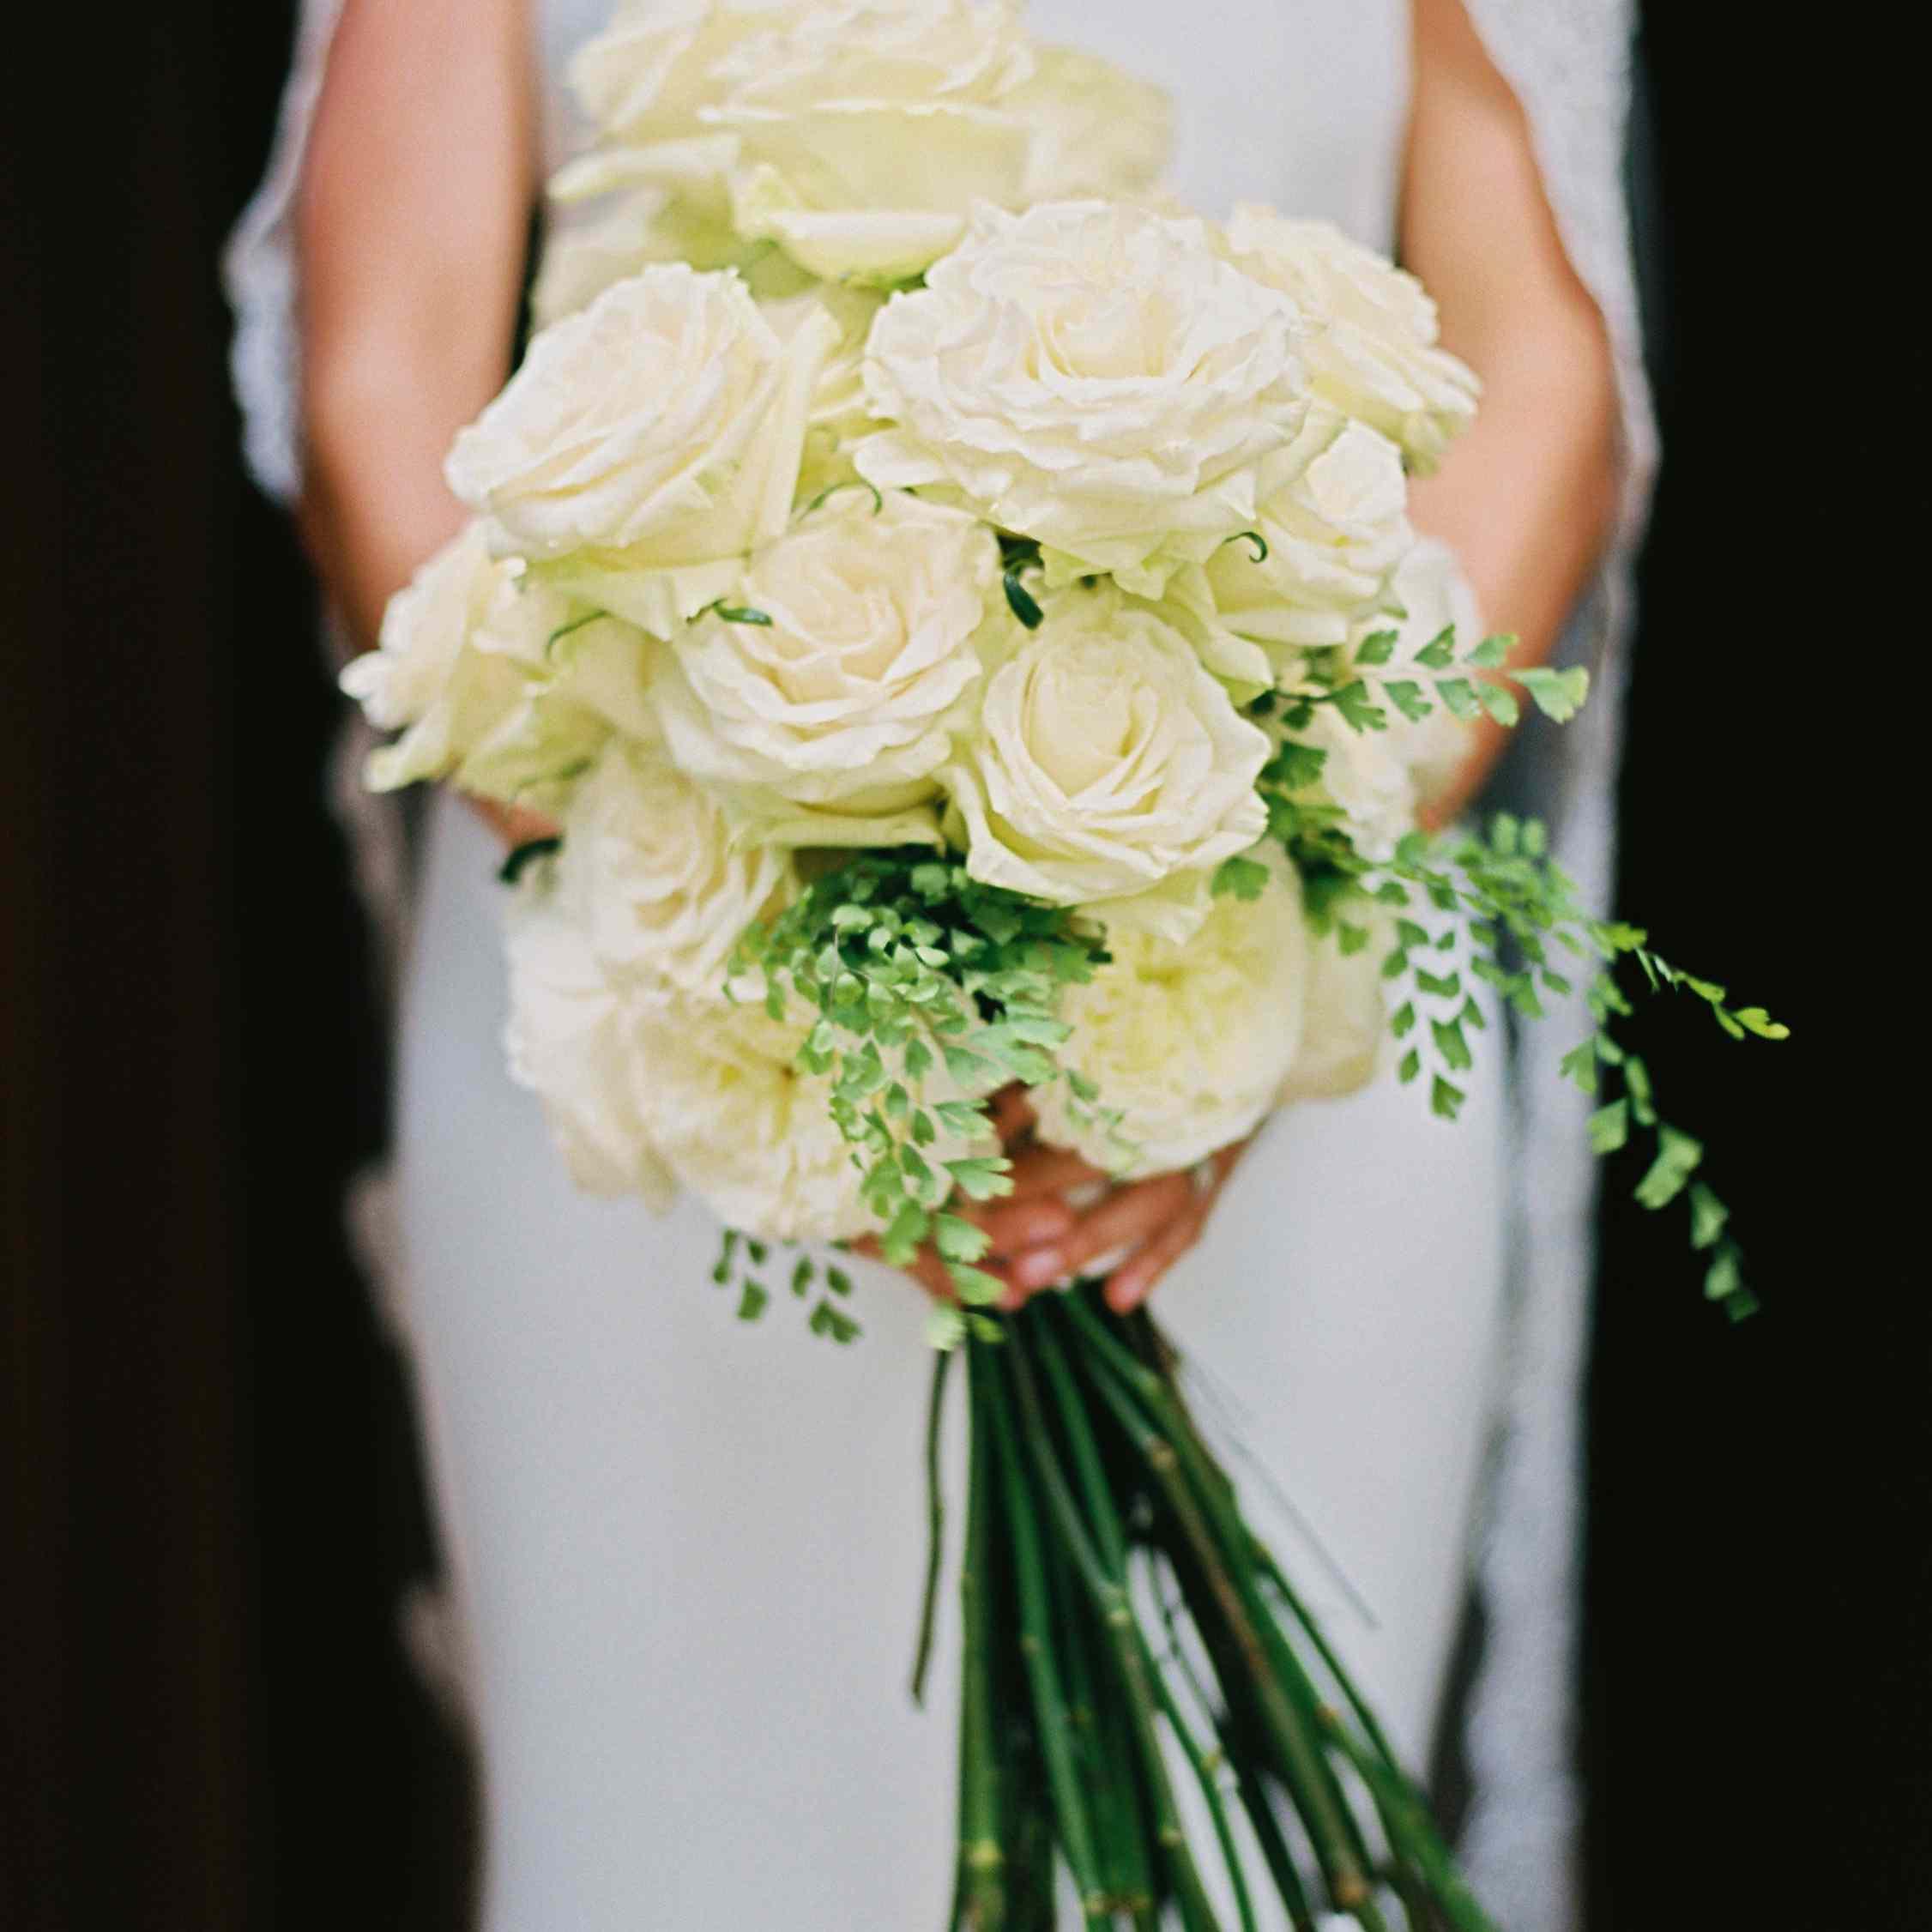 Soft white long stem rose bouquet